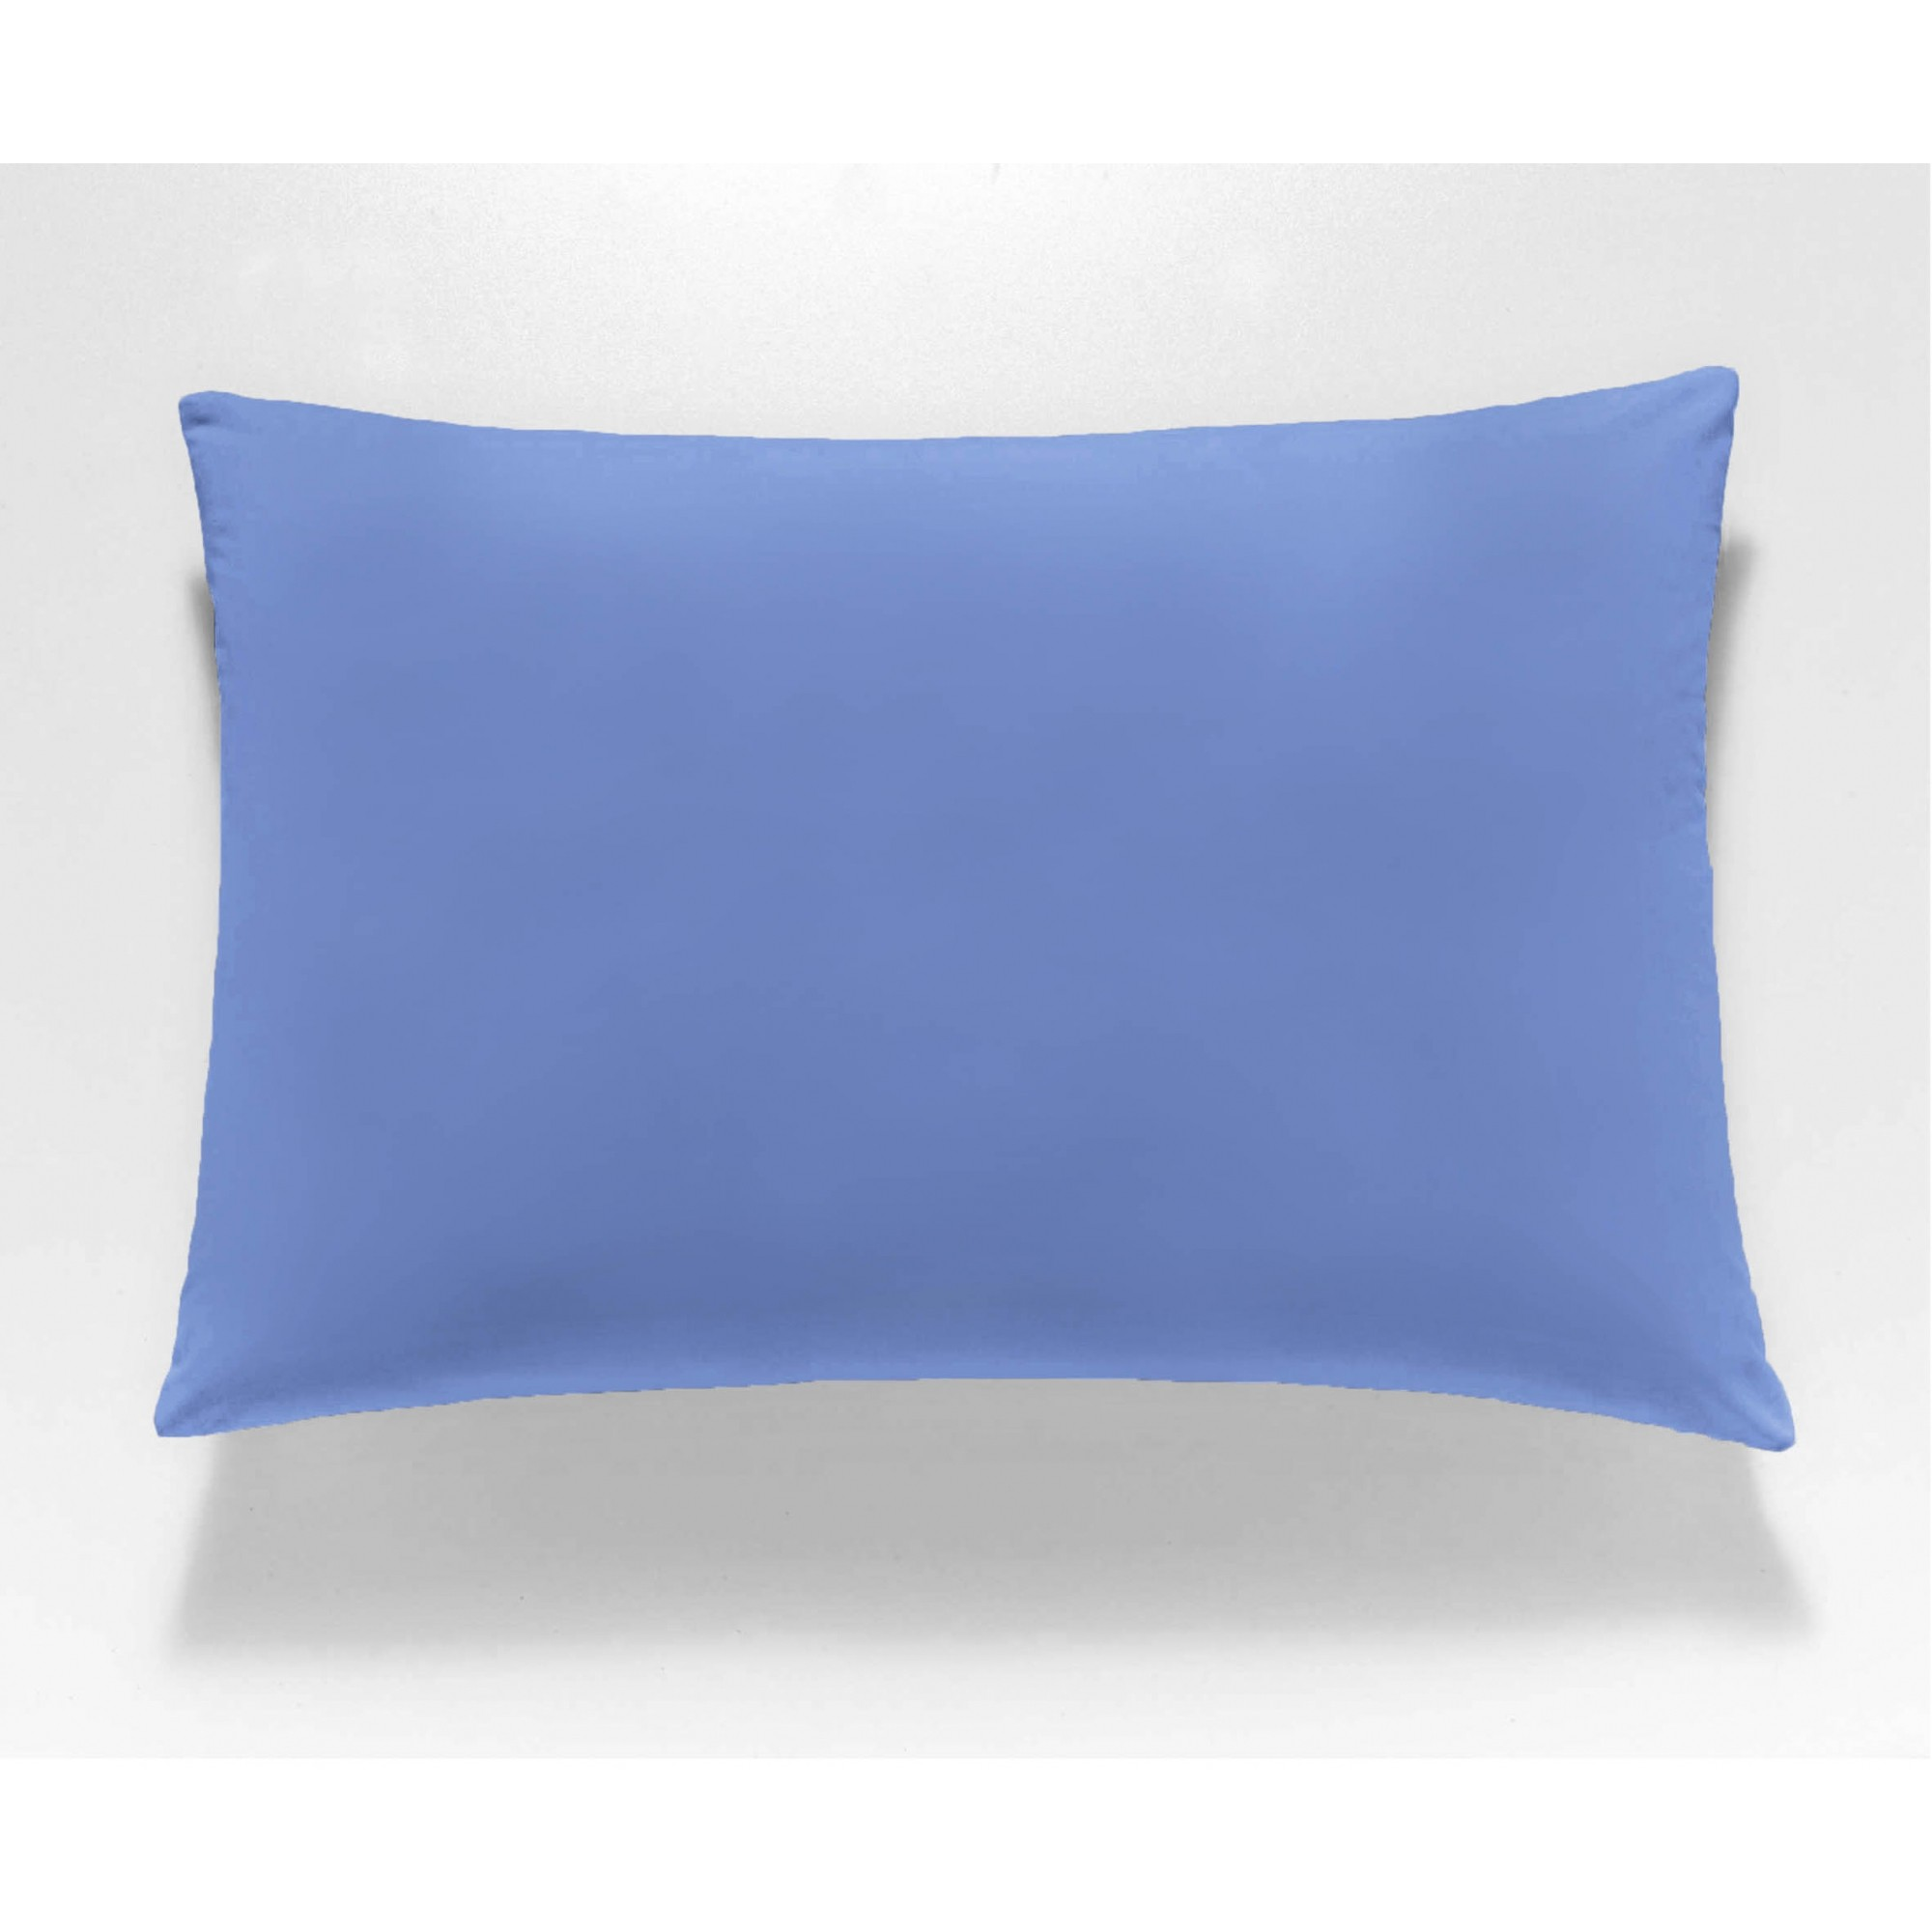 Fronha Avulsa - Royal - Azul 6224 - 100% Algodão - Santista